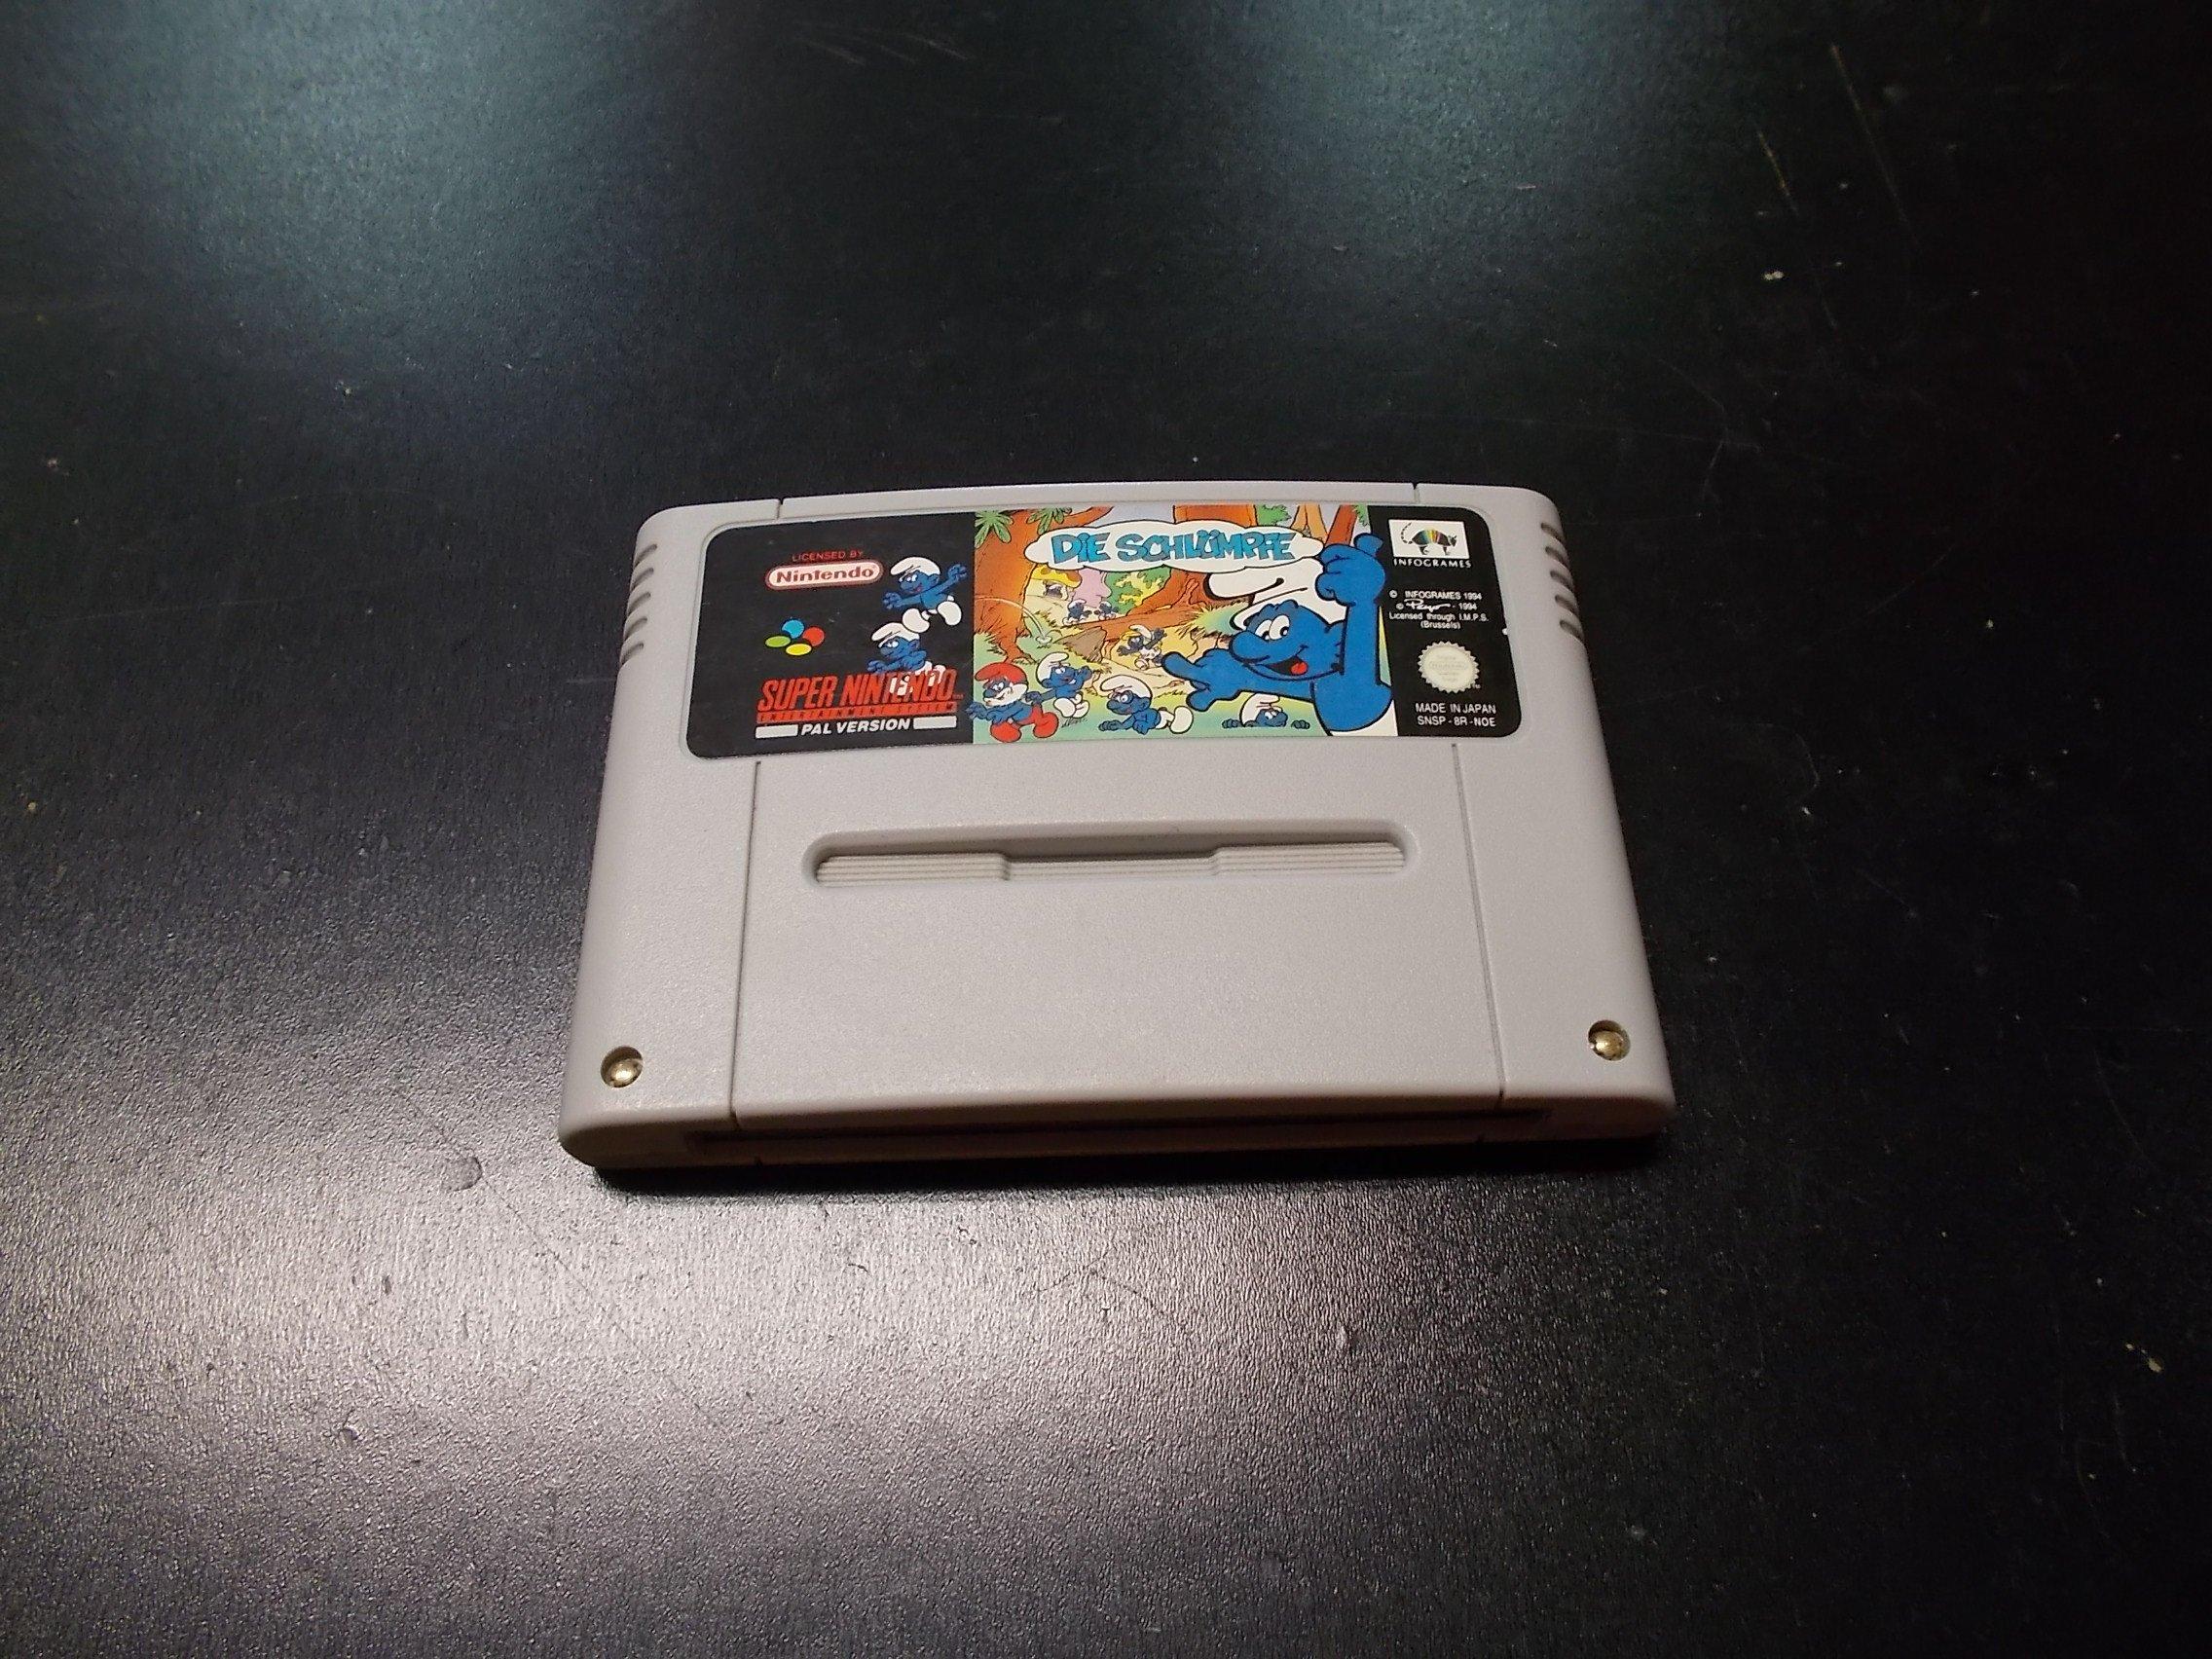 DIE SCHLUMPFE SMERFY - GRA Nintendo SNES Opole 0218